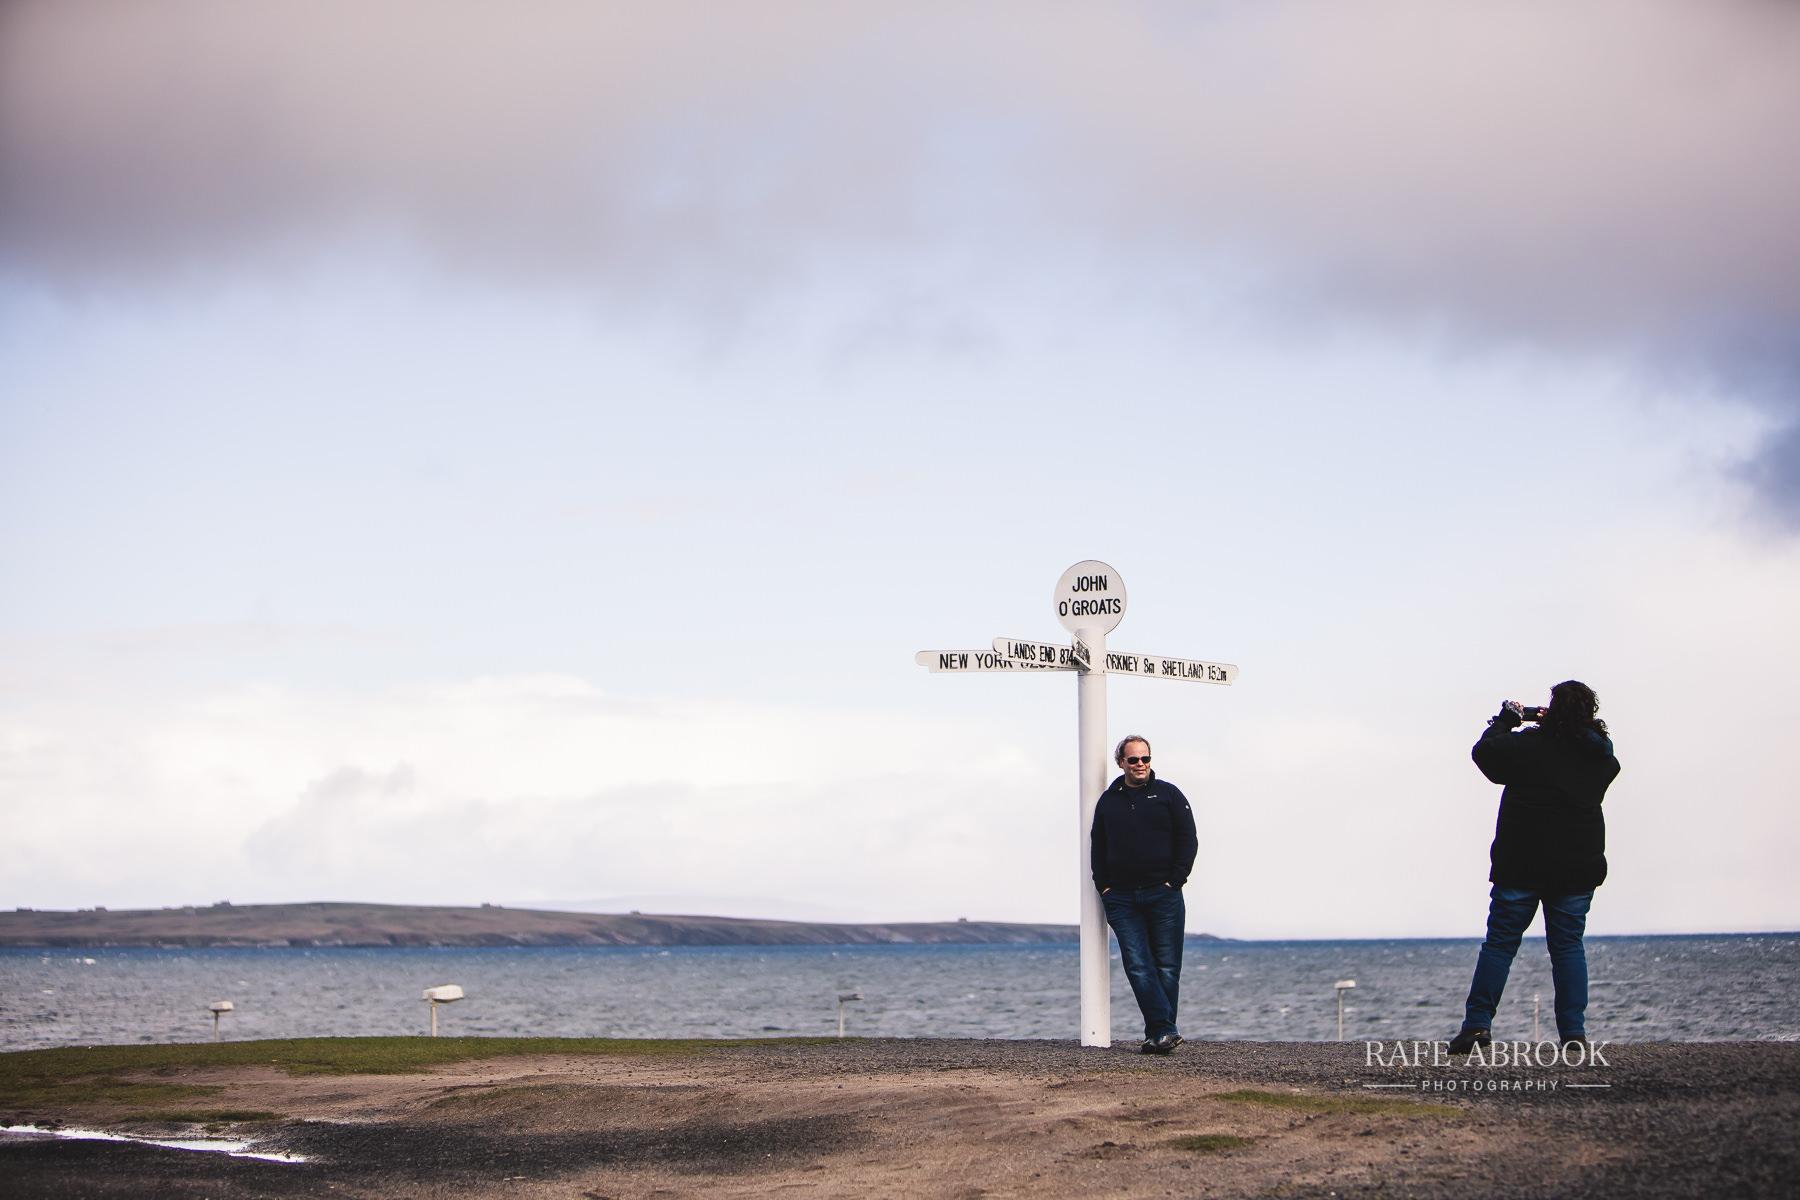 north coast 500 scotland porsche cayman gt4 golf r estate rafe abrook photography-1022.jpg